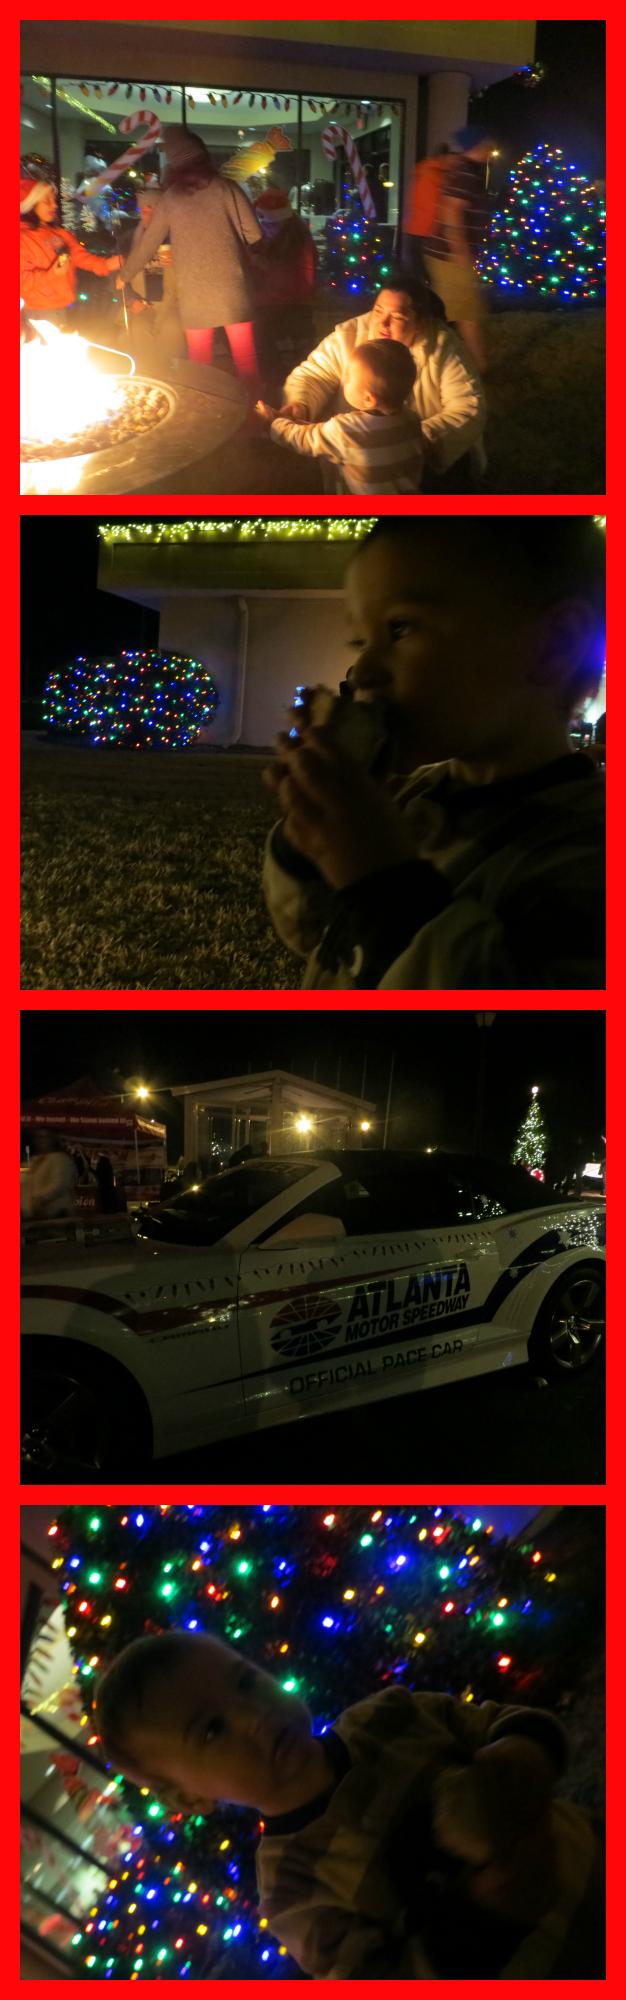 atlanta motor speedway christmas village